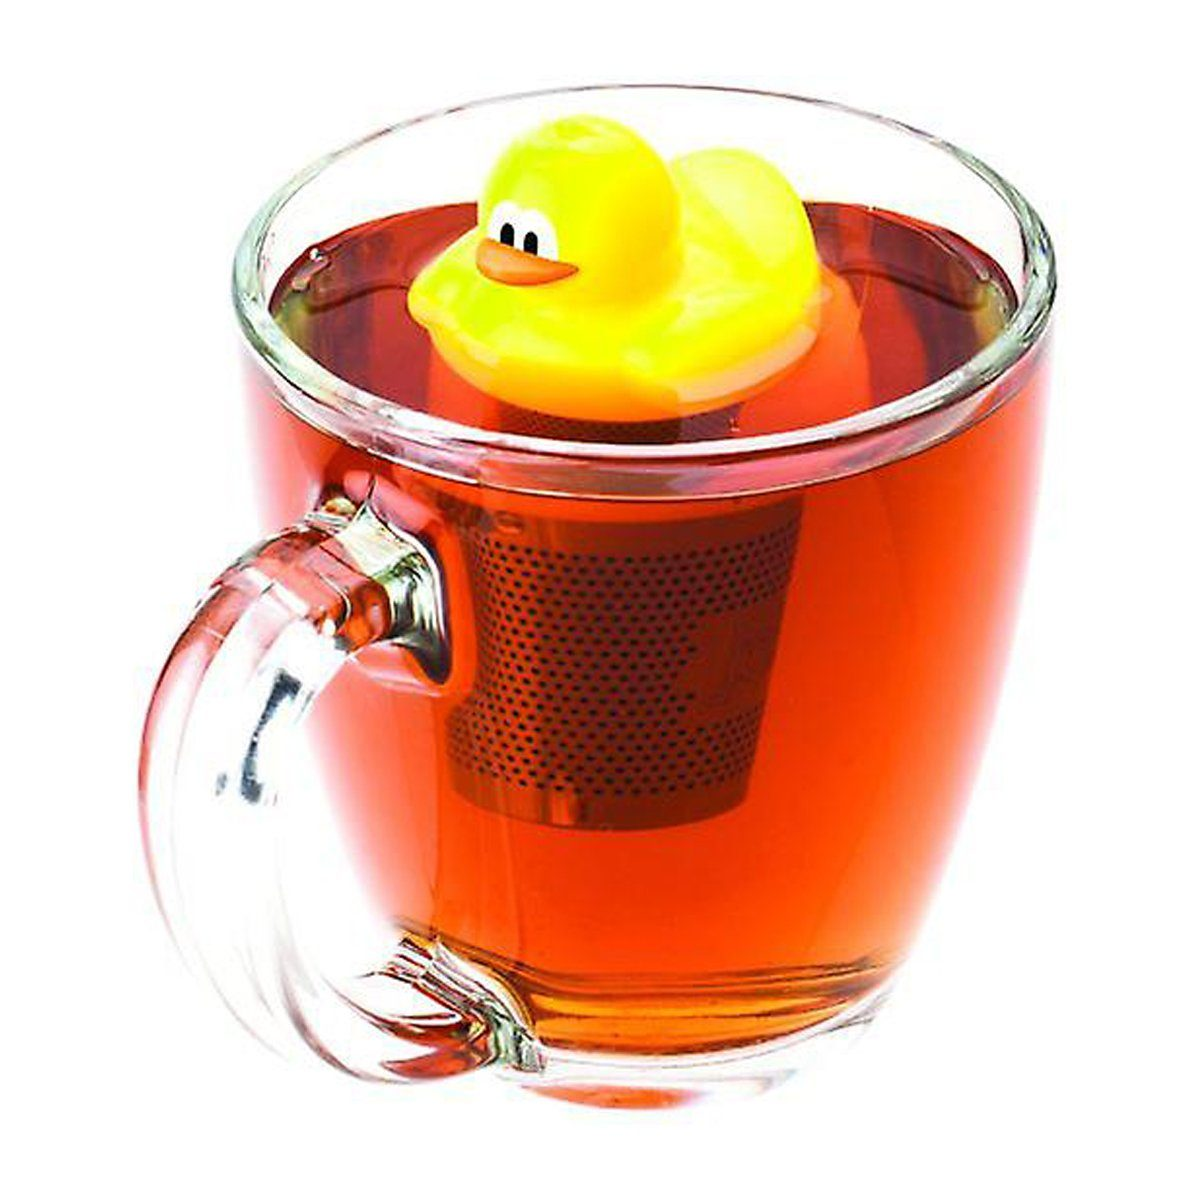 Joie Joie Tee-Ei Quack